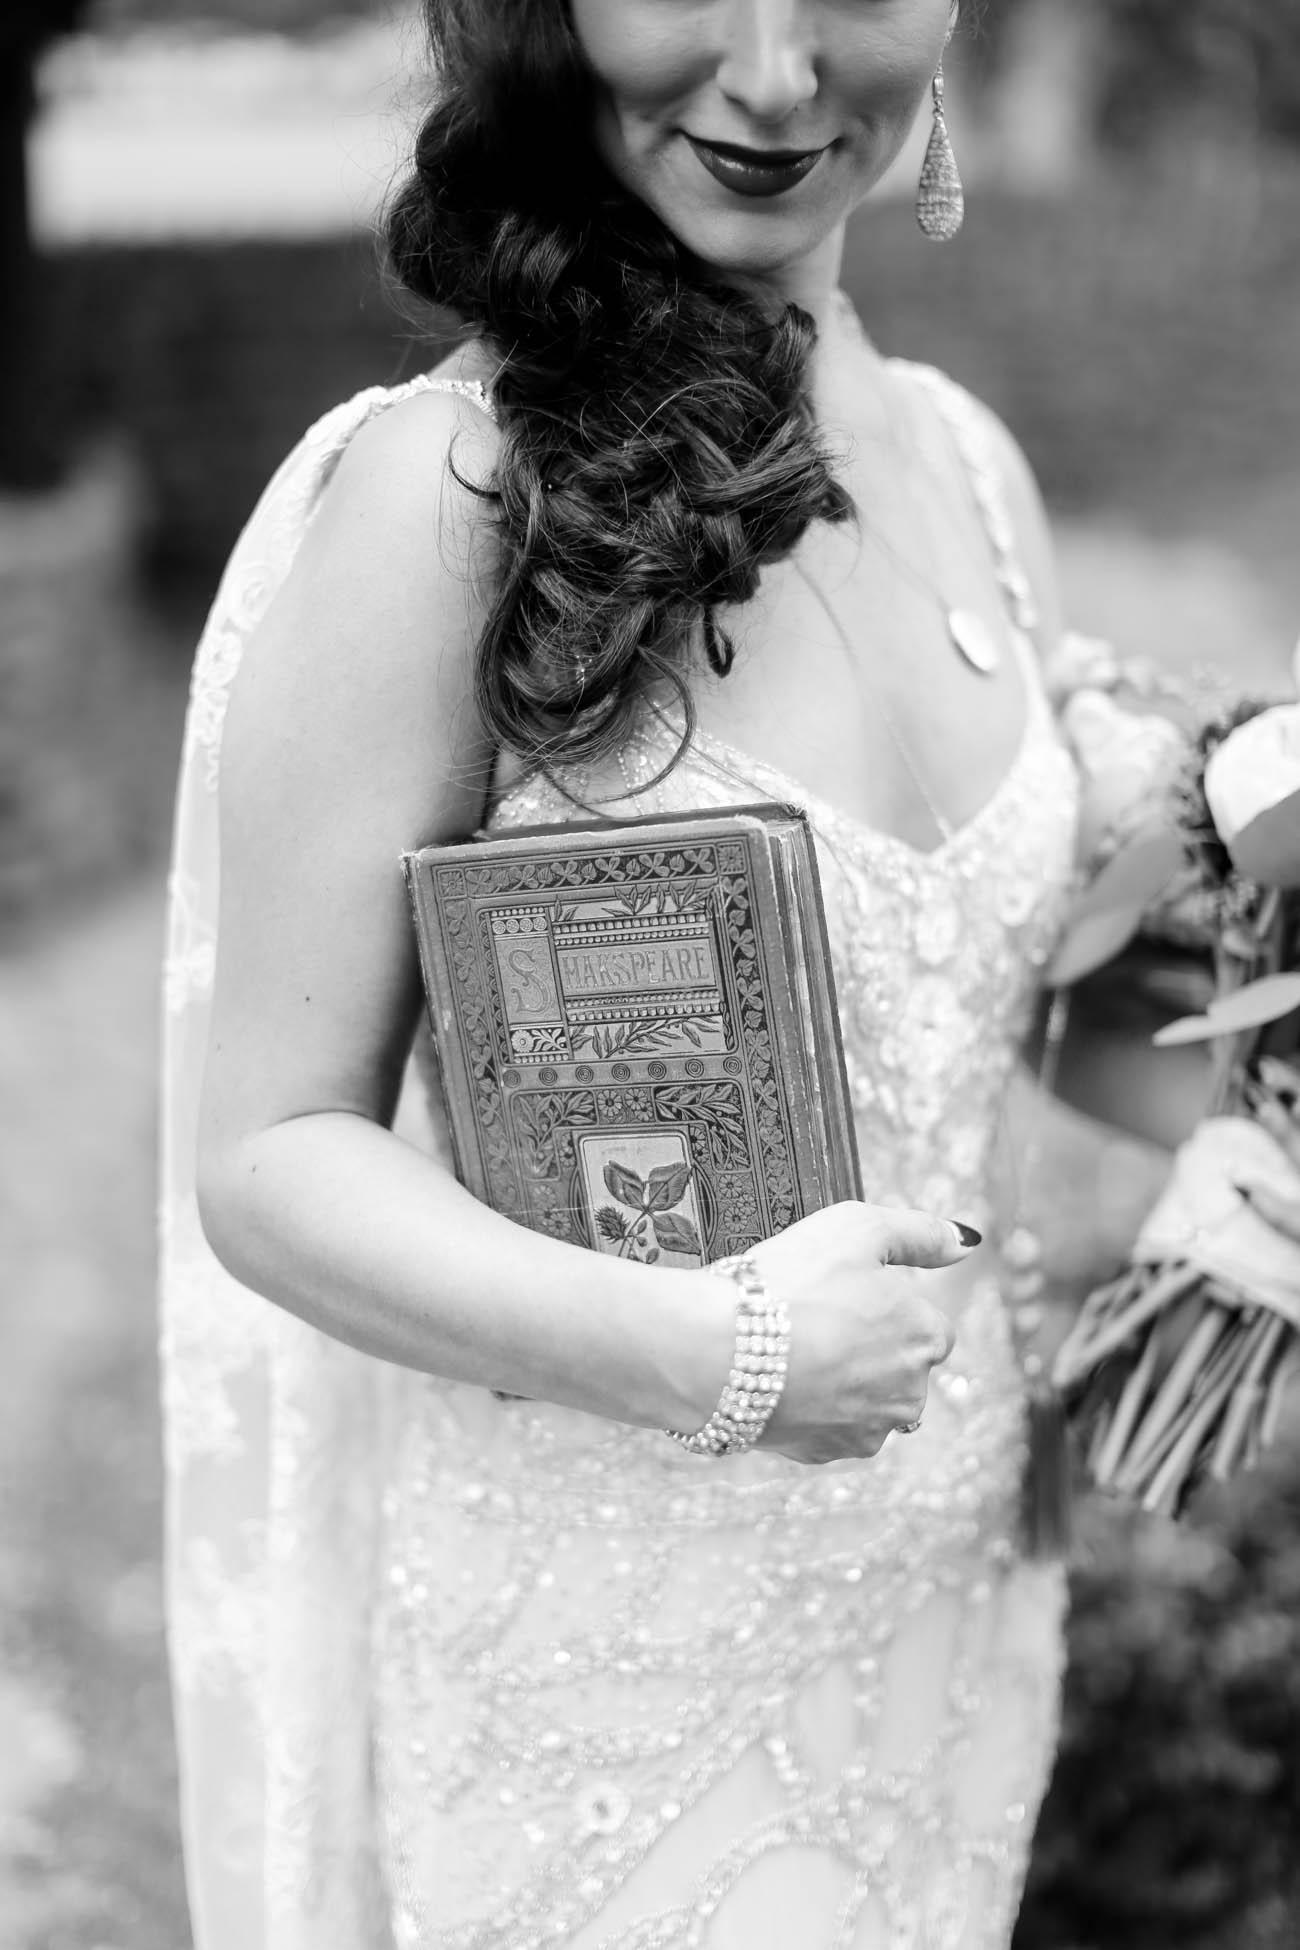 Speakeasy-1920s-theme-Louisville-and-Lexington Wedding-140.jpg